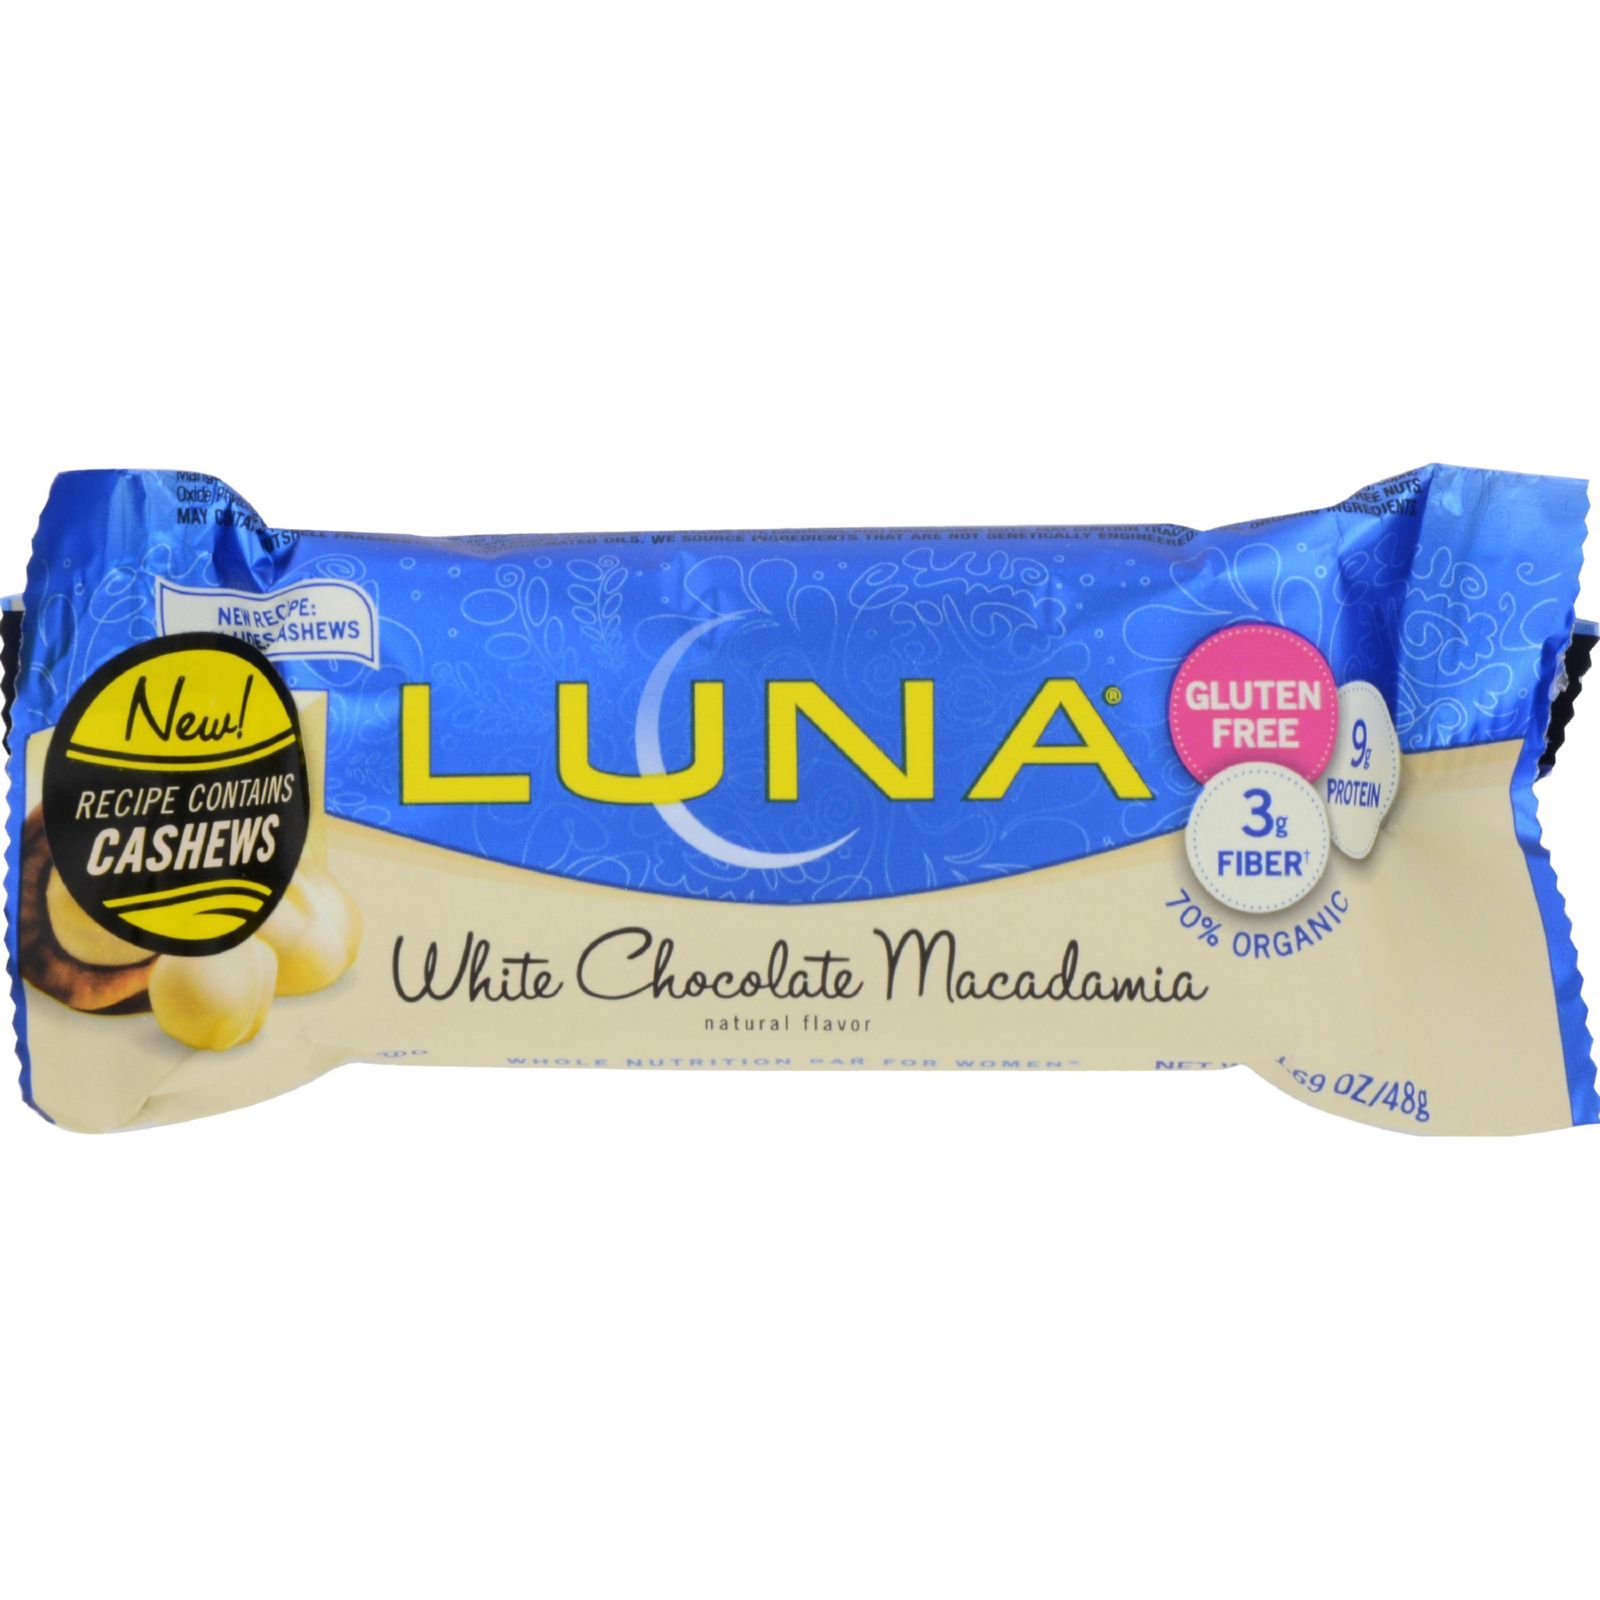 Clif Bar Luna Bar - Organic White Chocolate Macadamia Nut - Case of 15 - 1.69 oz